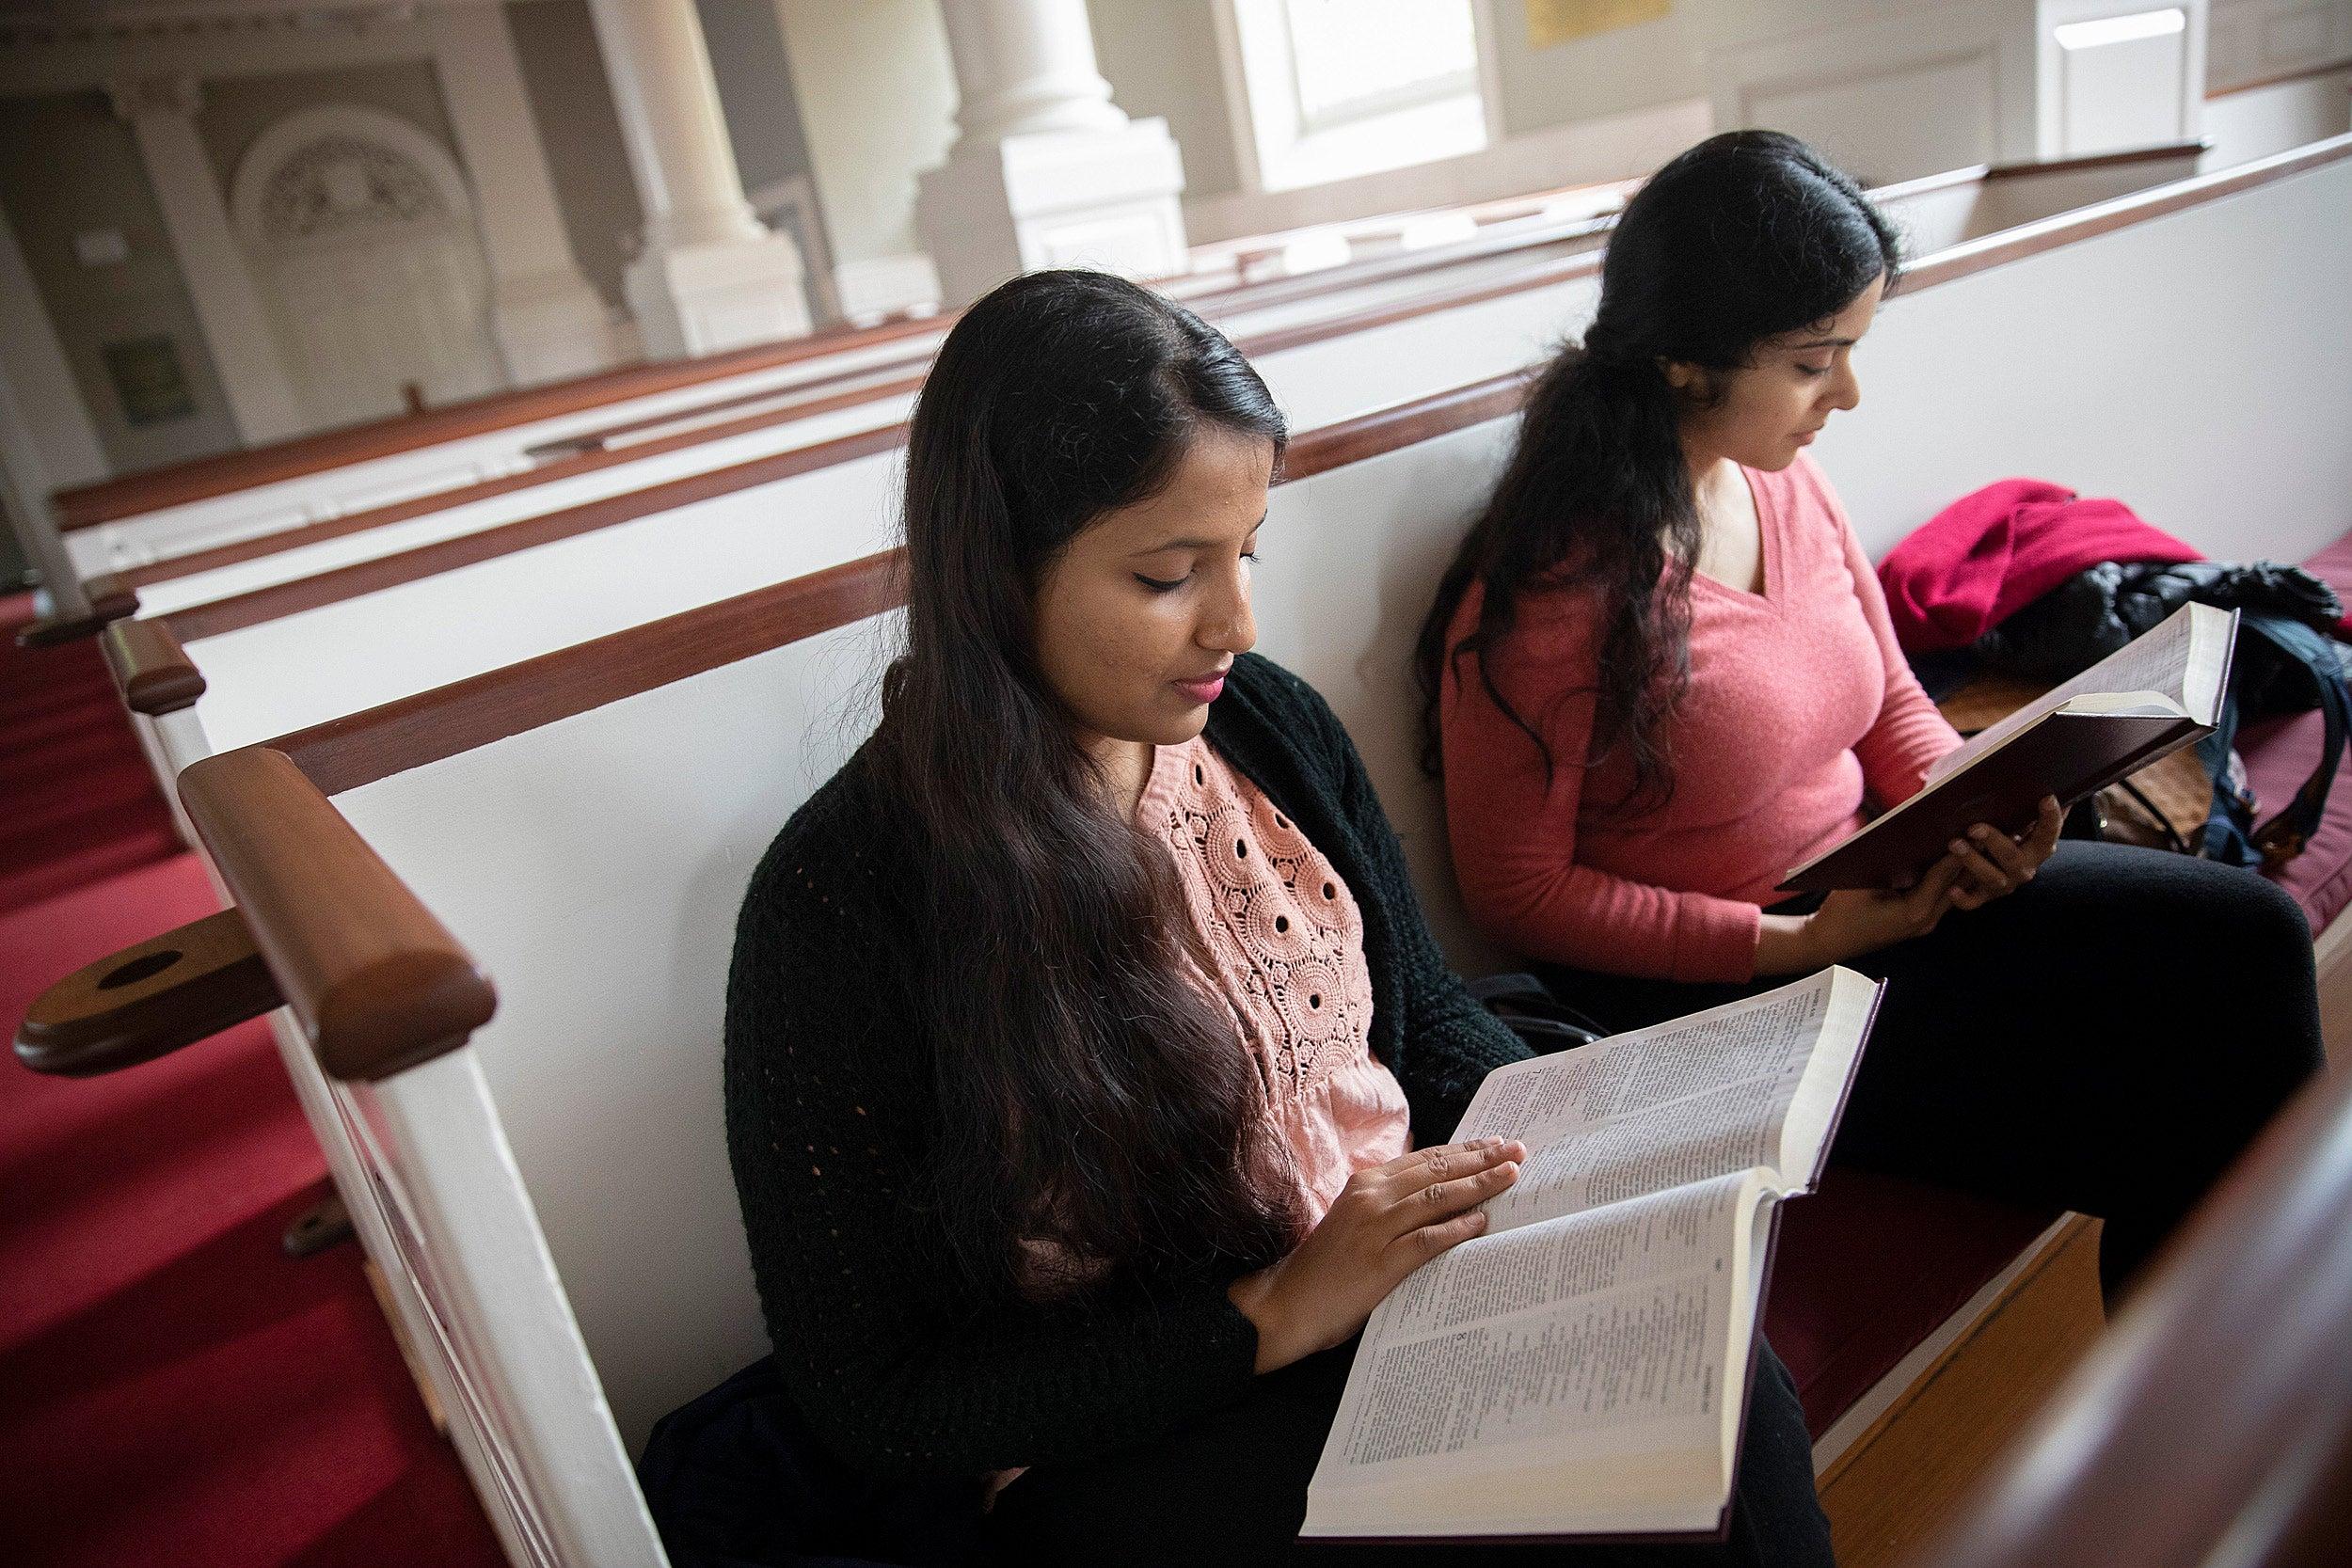 Lalitha Sindhuri (left) and Anandana Kapur read the Bible.